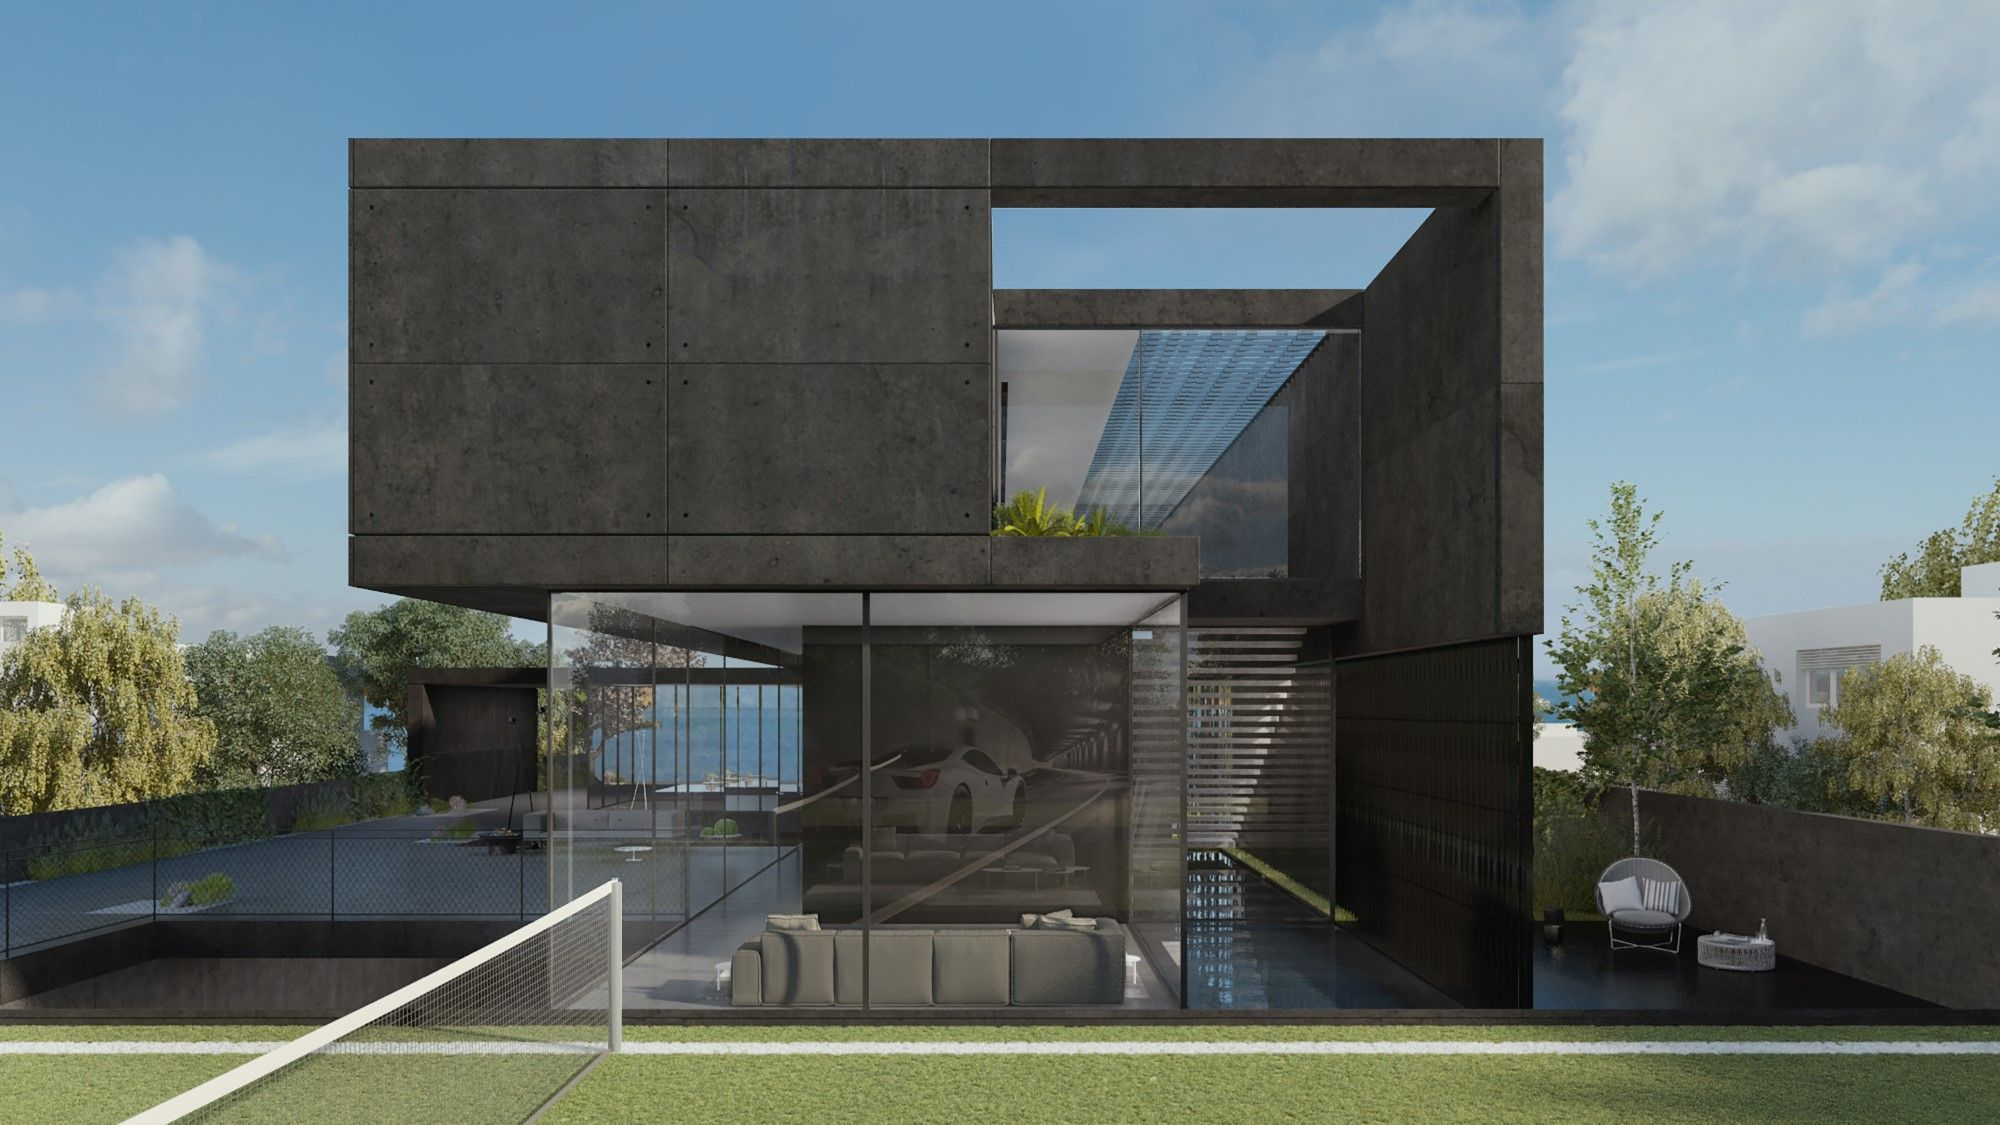 Black Concrete House - Pitsou Kedem   Renderings   Pinterest ...